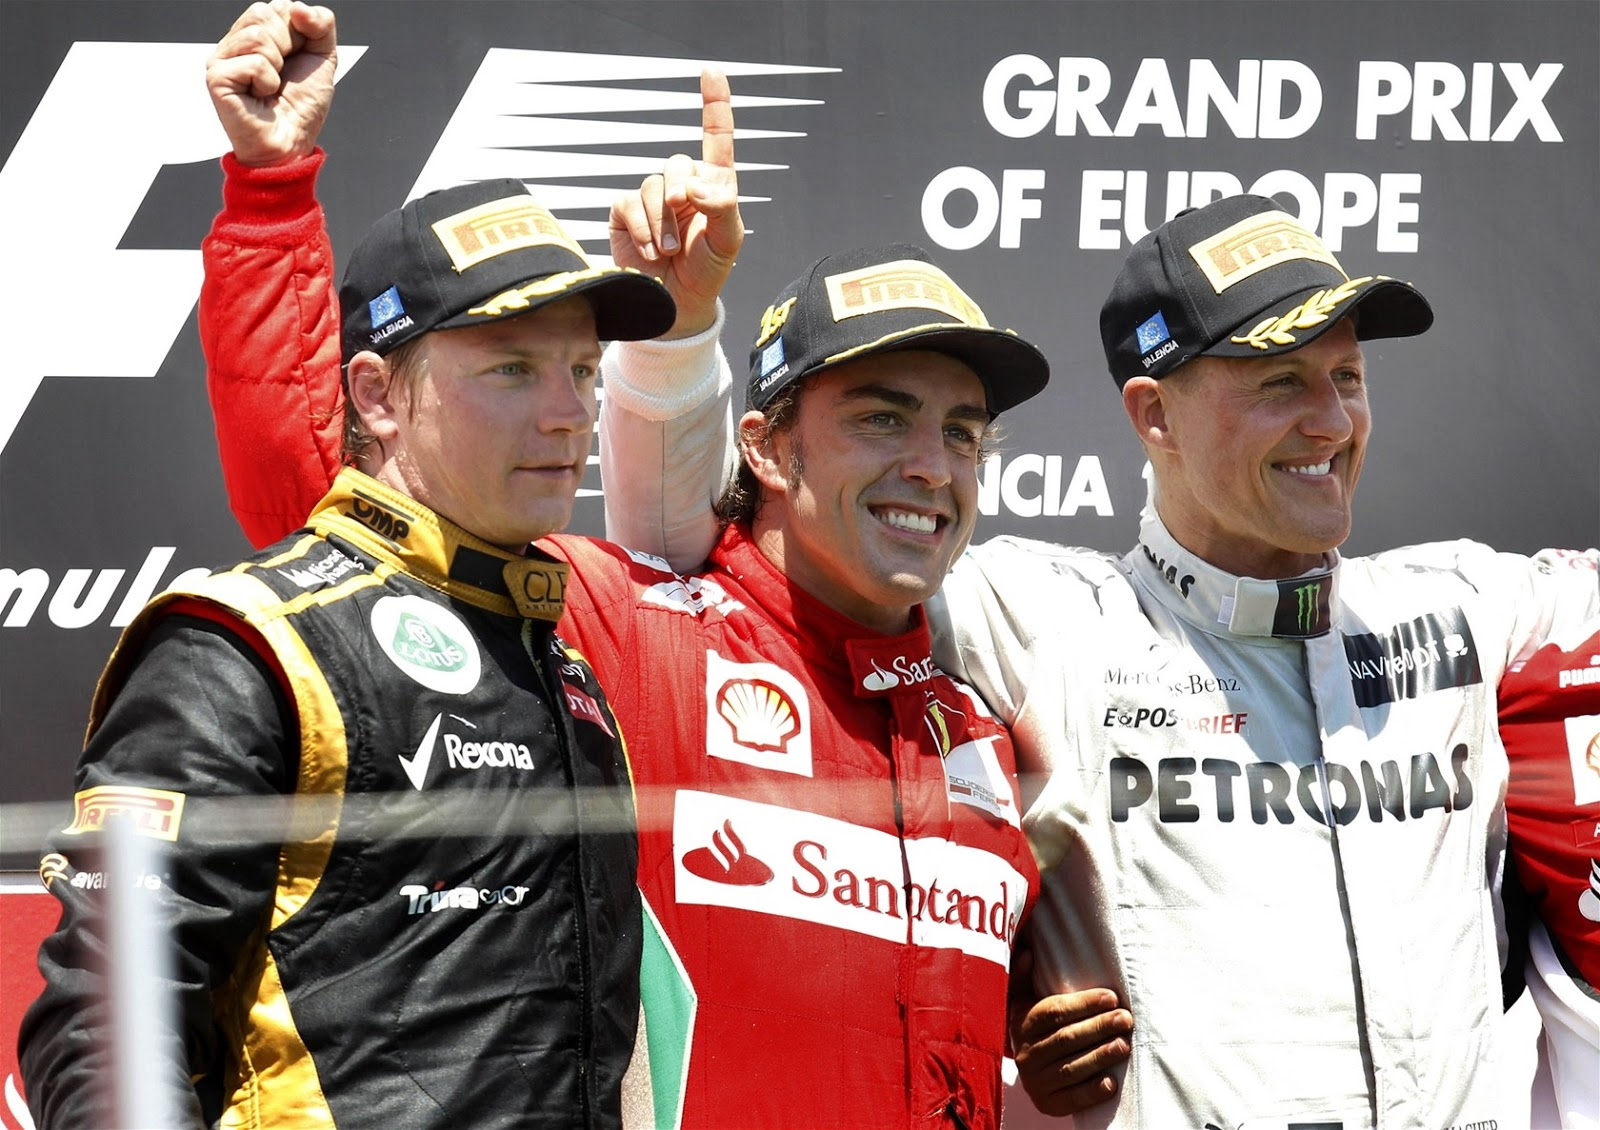 Sunshine on Formula 1 ♥: Gran Premio d'Europa 2012 fully